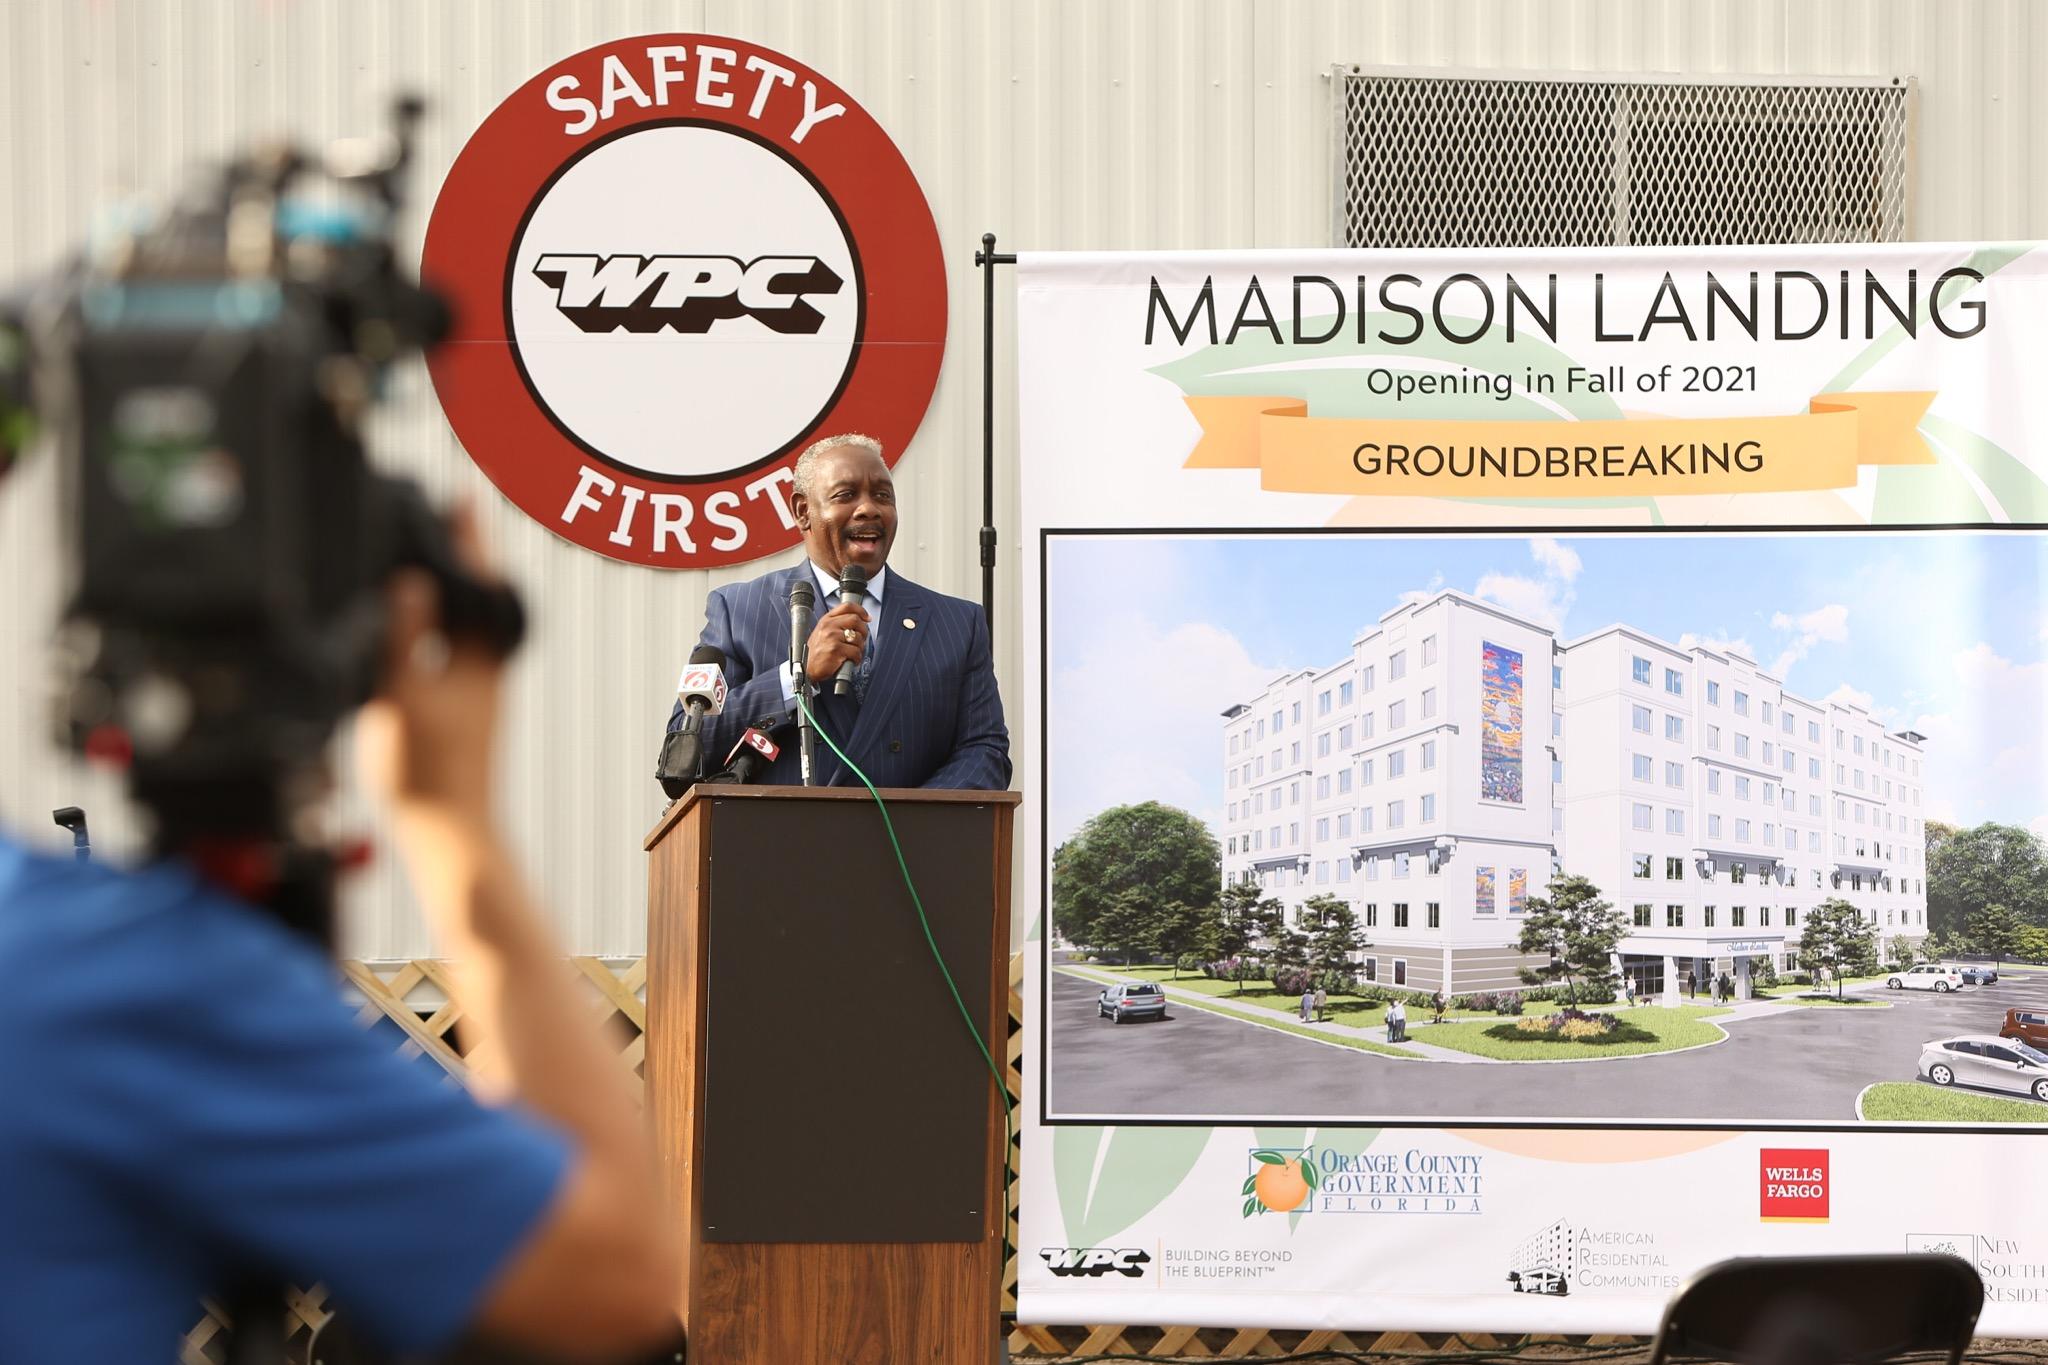 Mayor Demings speaks at Madison Landing's groundbreaking at a podium